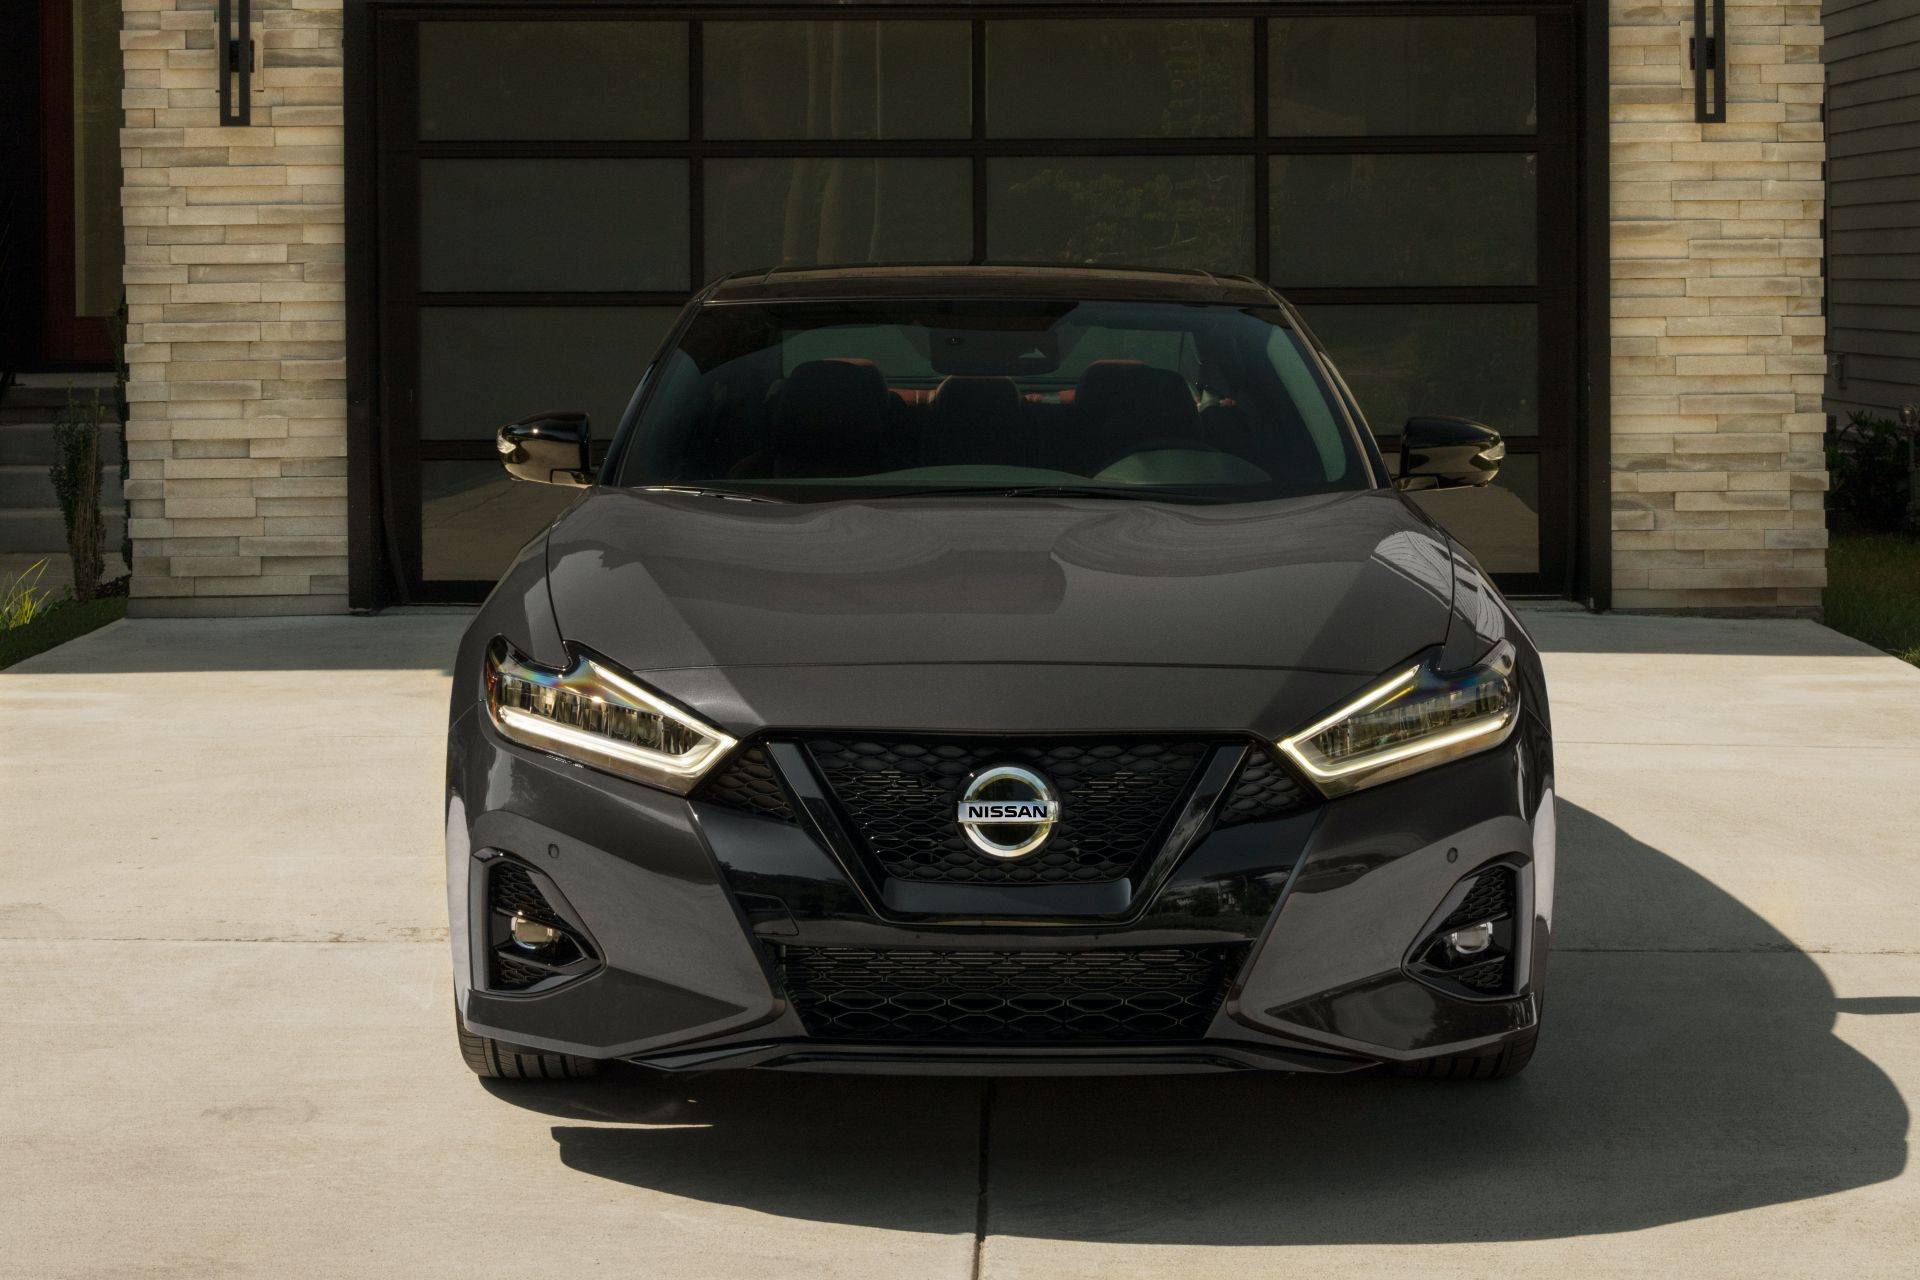 Nissan-Maxima-40th-Anniversary-Edition-5